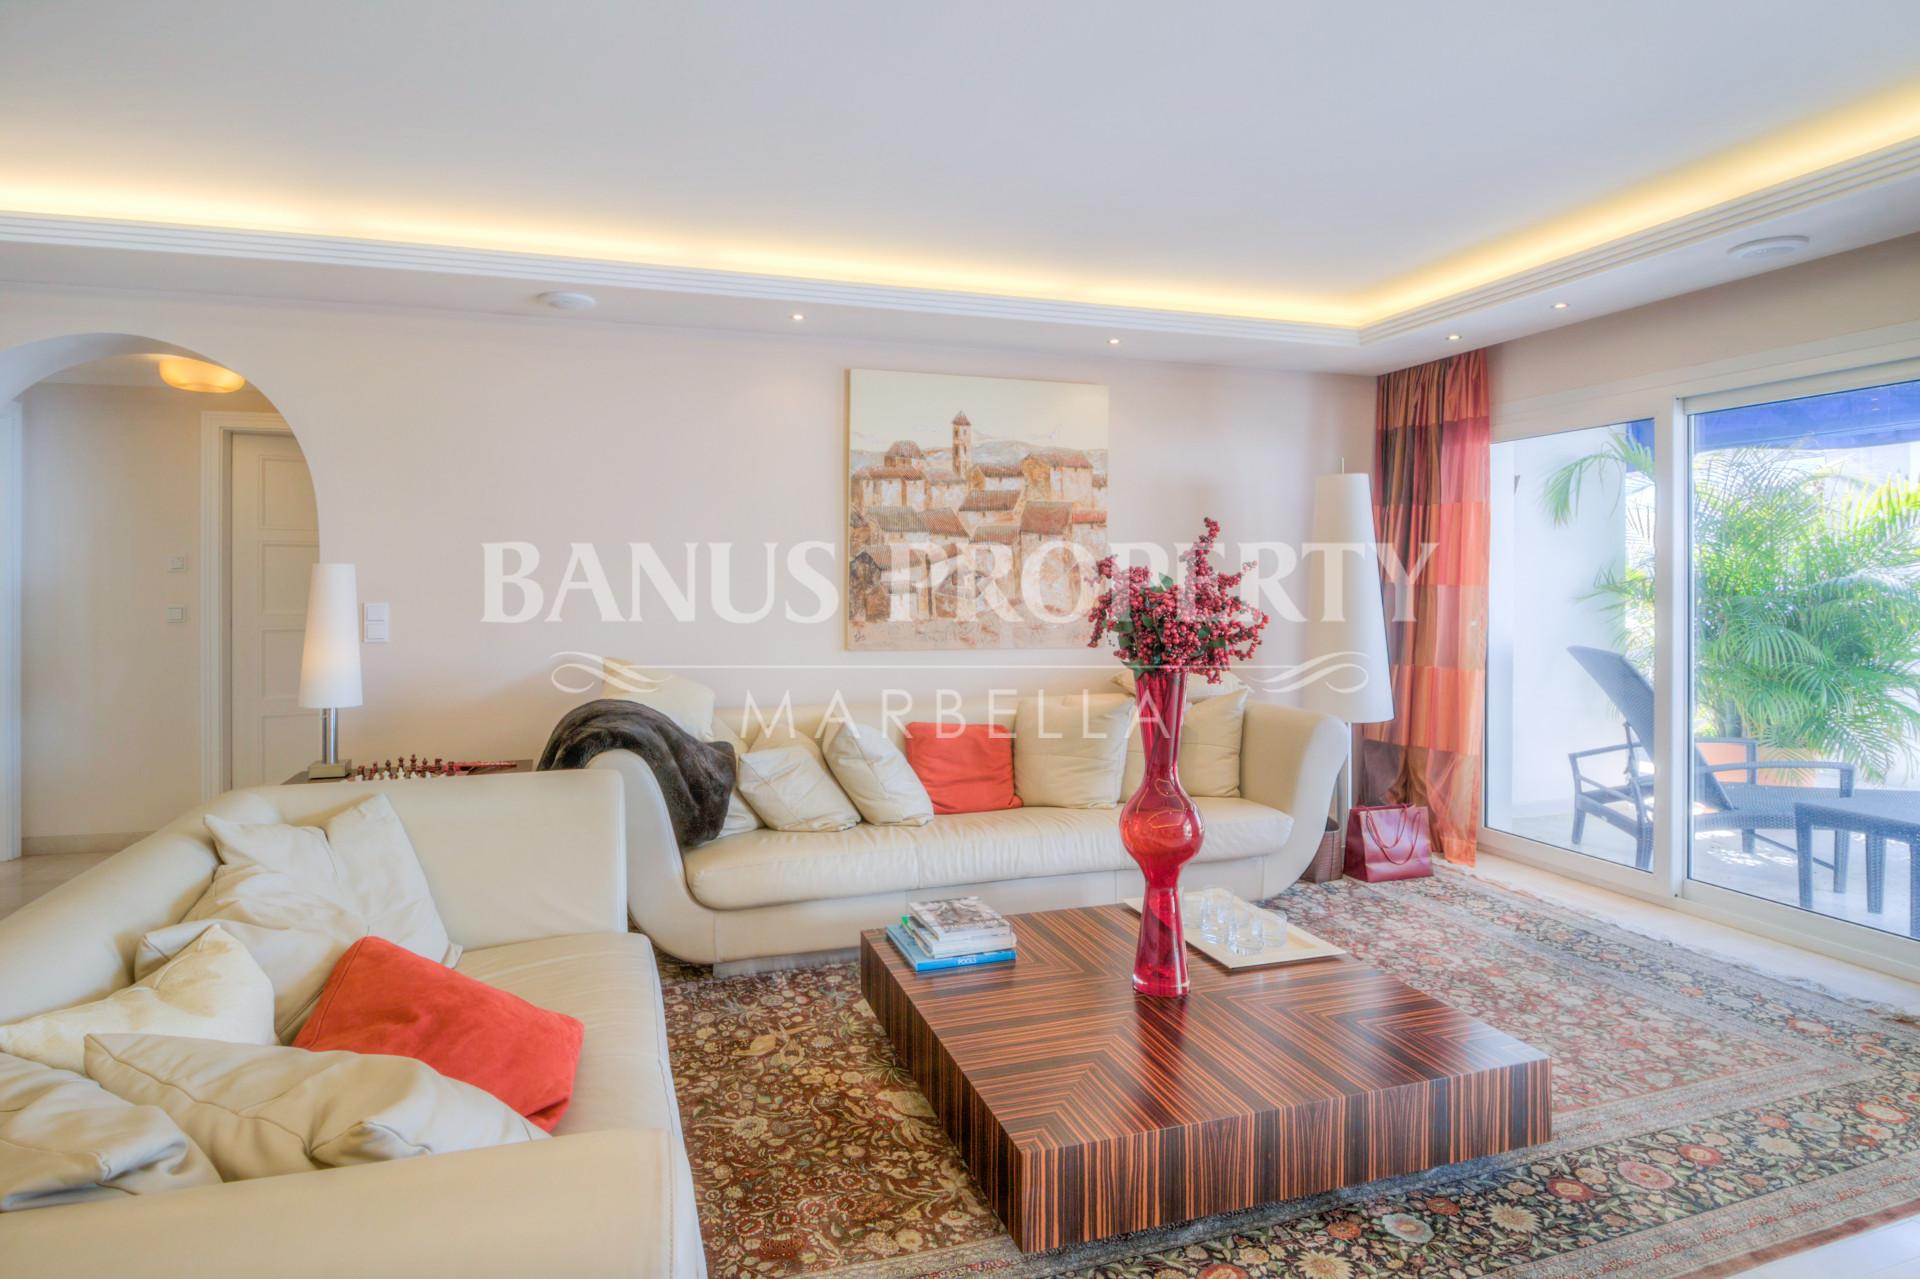 Luxury three bedroom penthouse apartment with breath taking views for sale in Edificio Malaga, Playas del Duque Puerto Banus